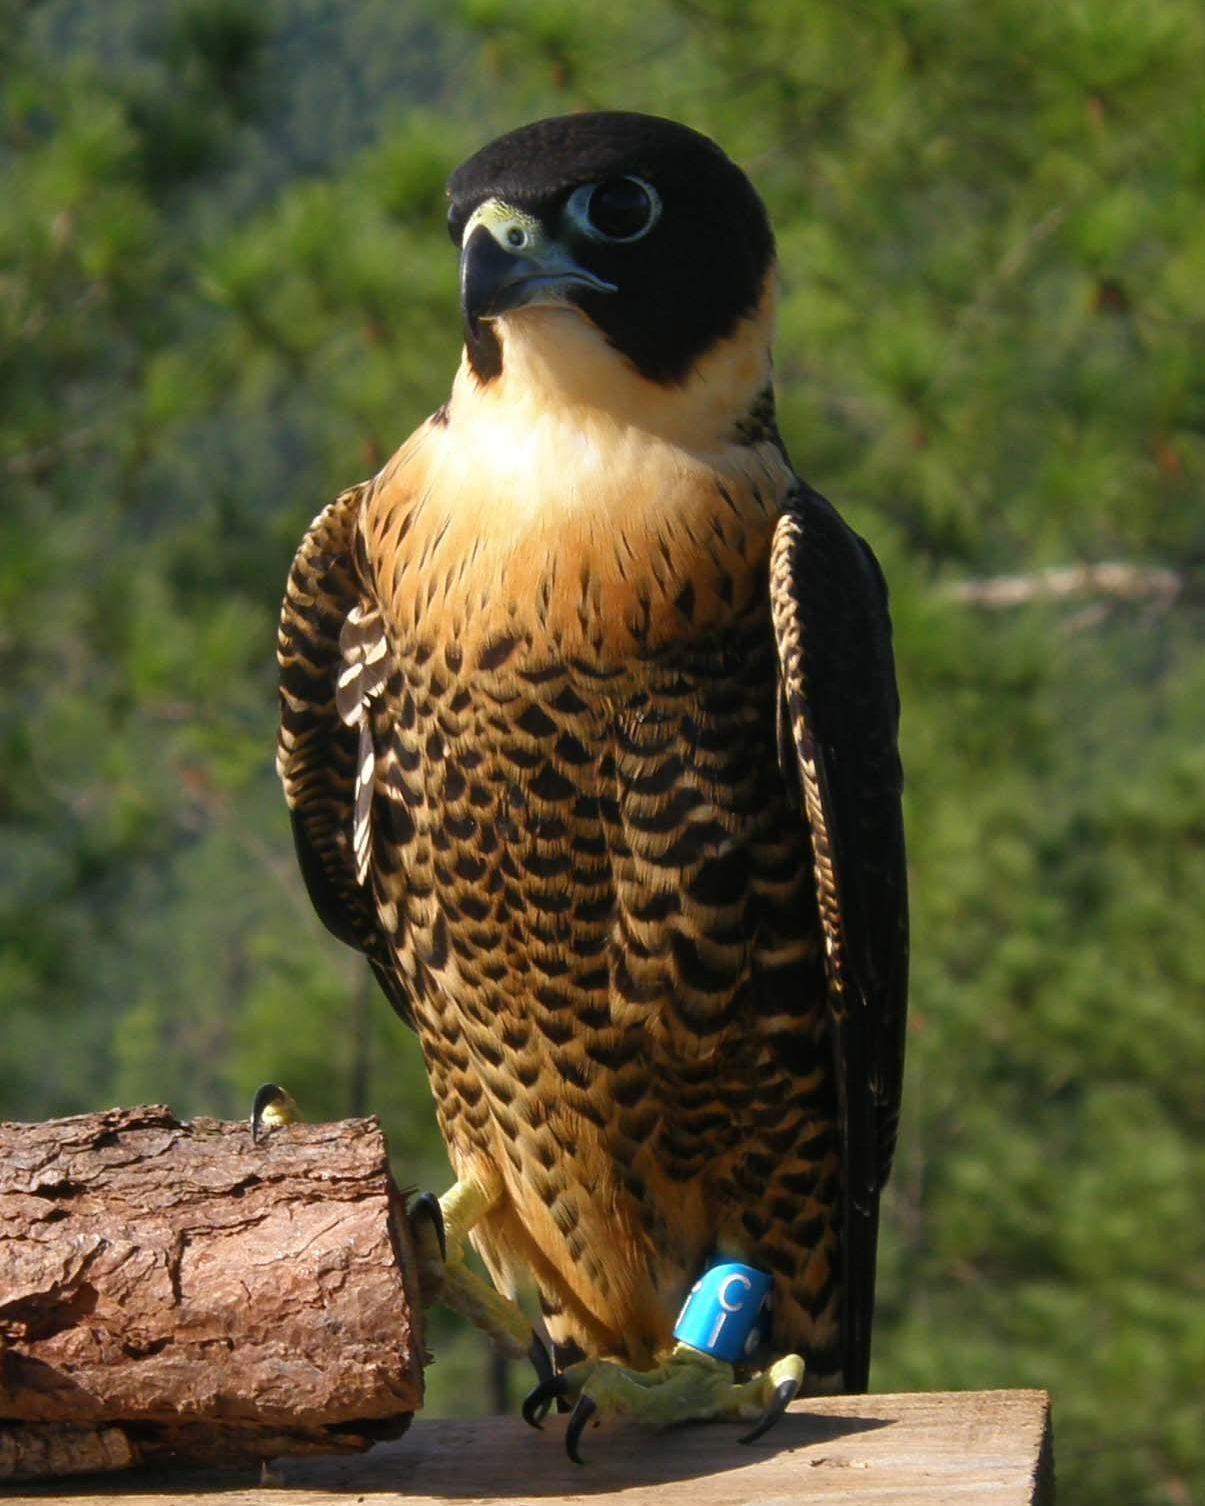 Orange-breasted Falcon Photo by Jenn Sinasac